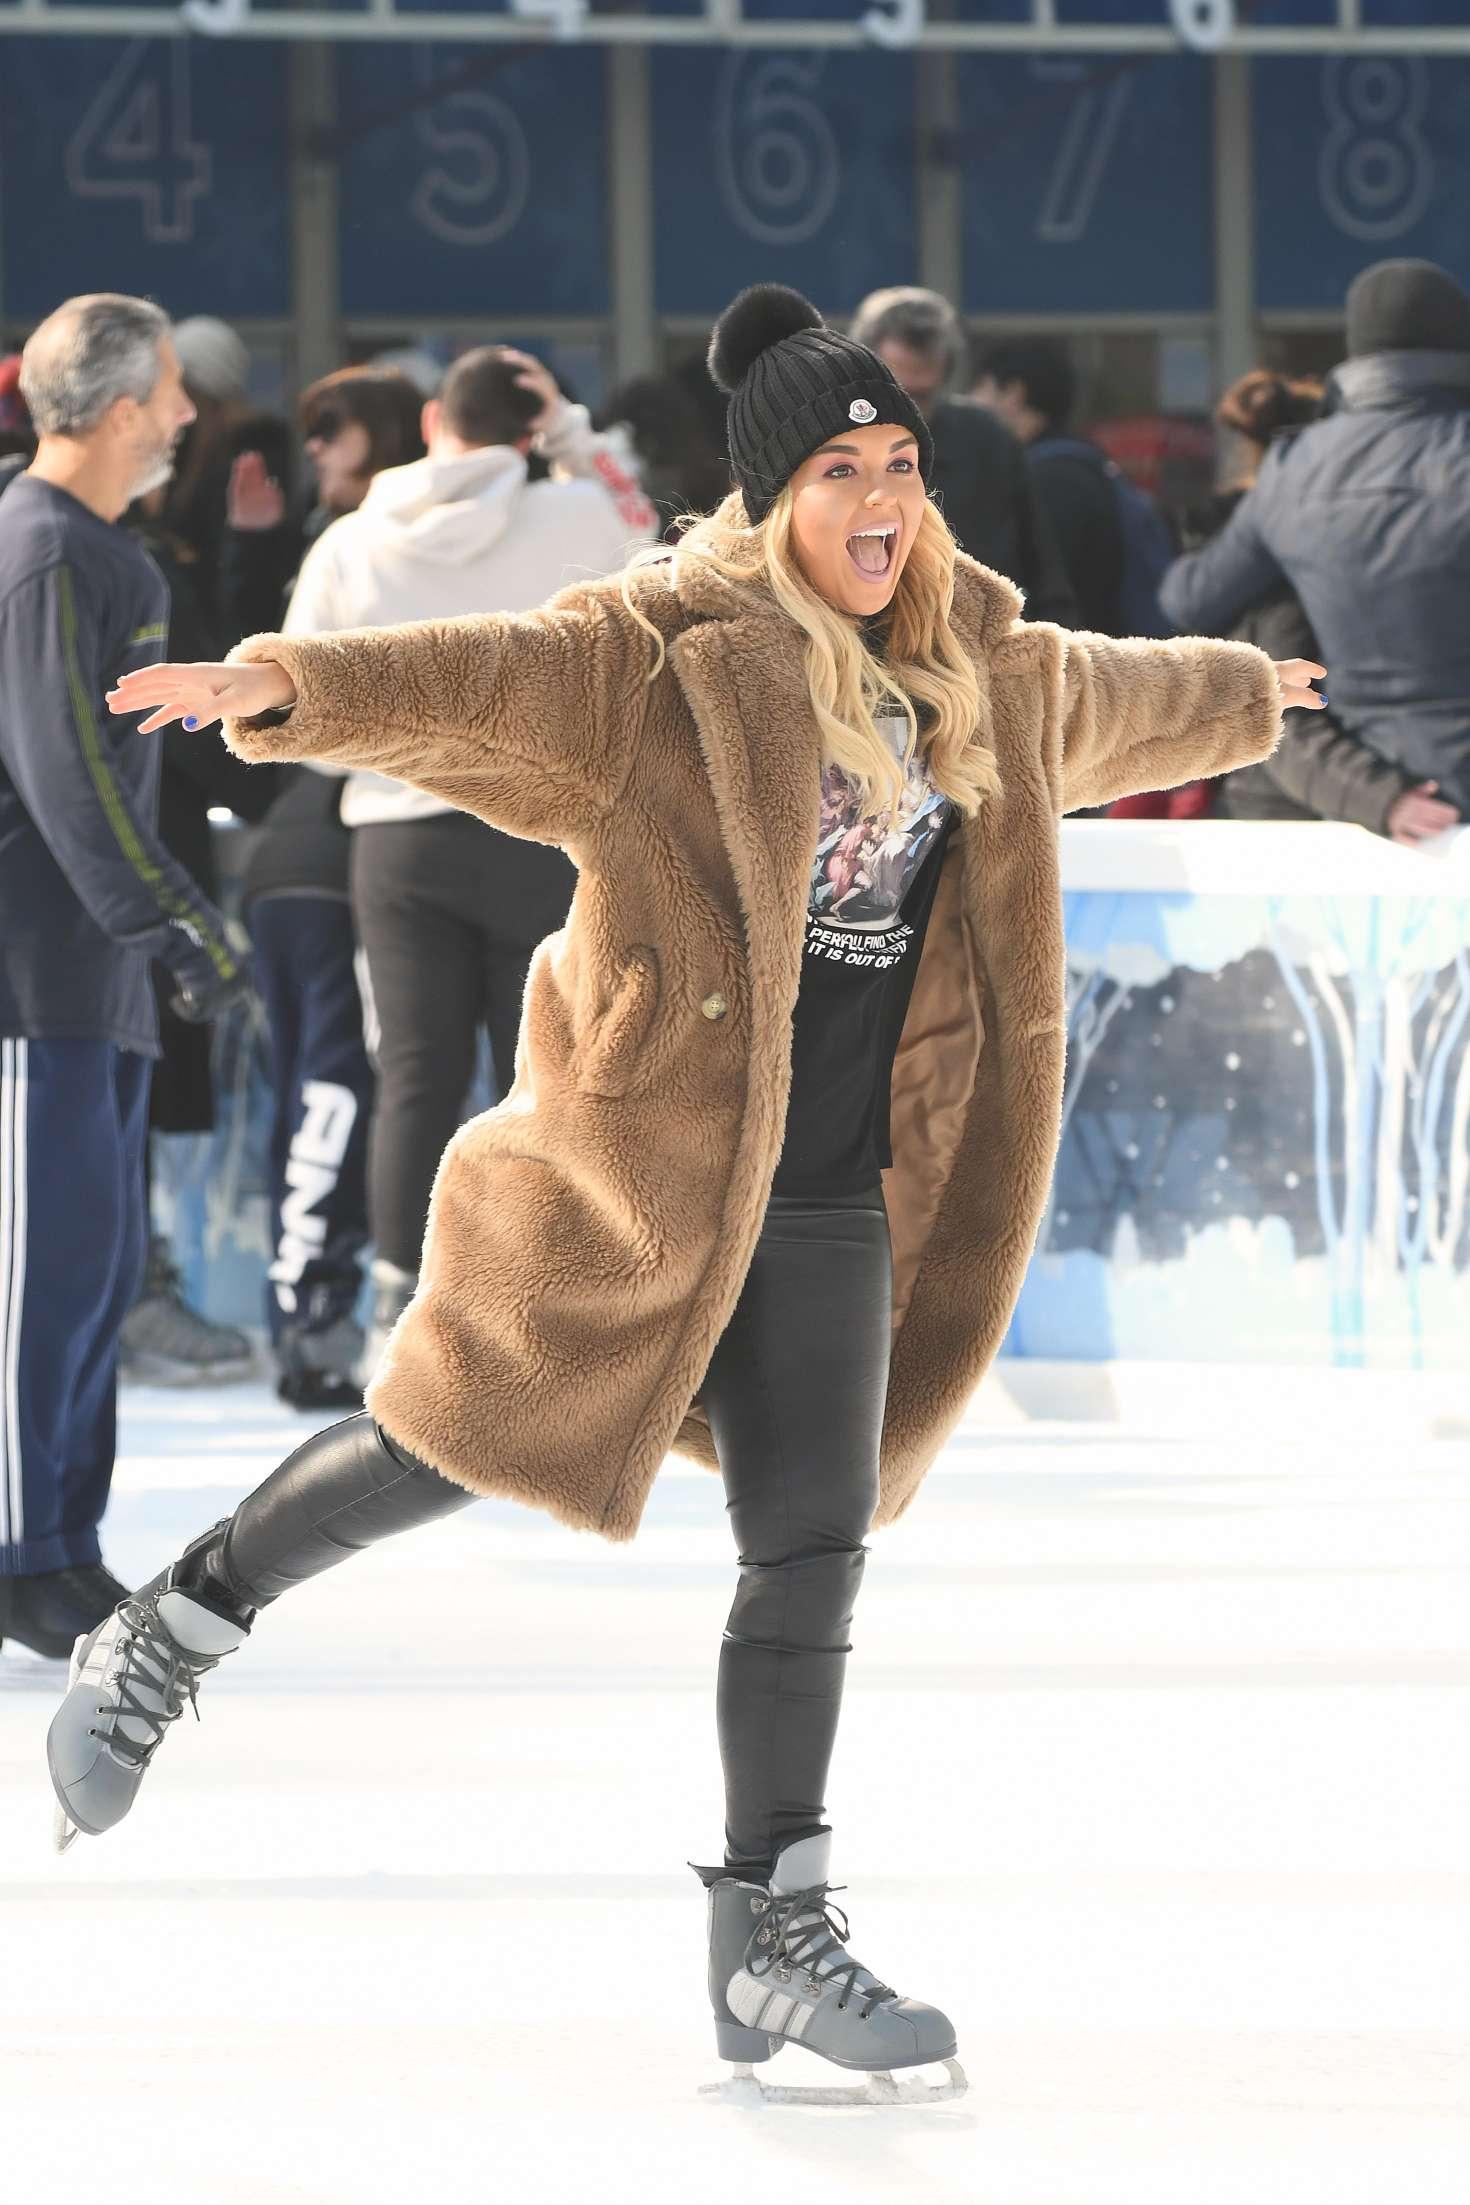 Tallia Storm 2018 : Tallia Storm: Ice skating in New York City -11